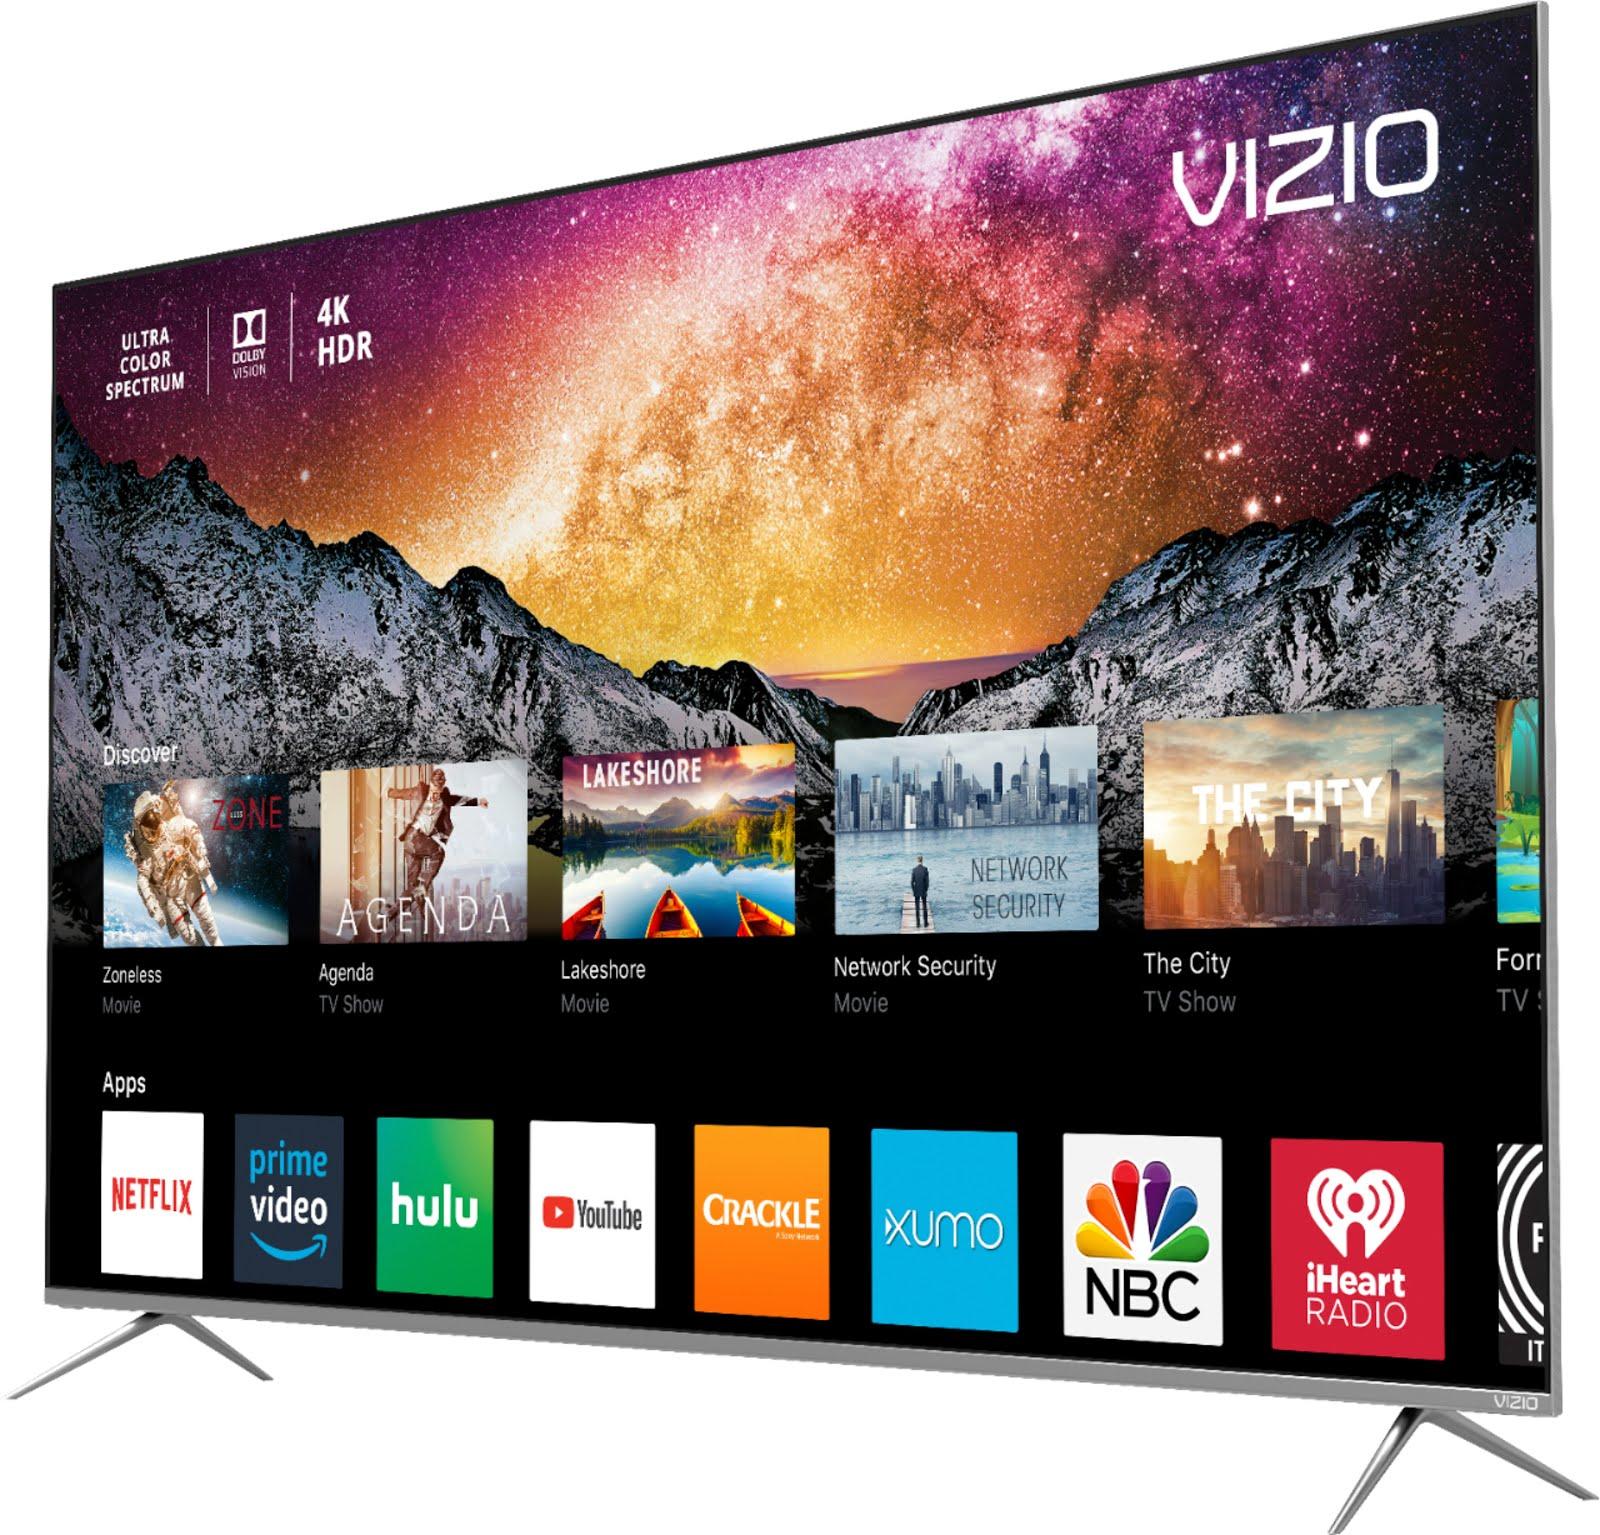 Best Buy Deals On Vizio P Series 55 Inch 4k Hdr Smart Tv Wrapped Up N U